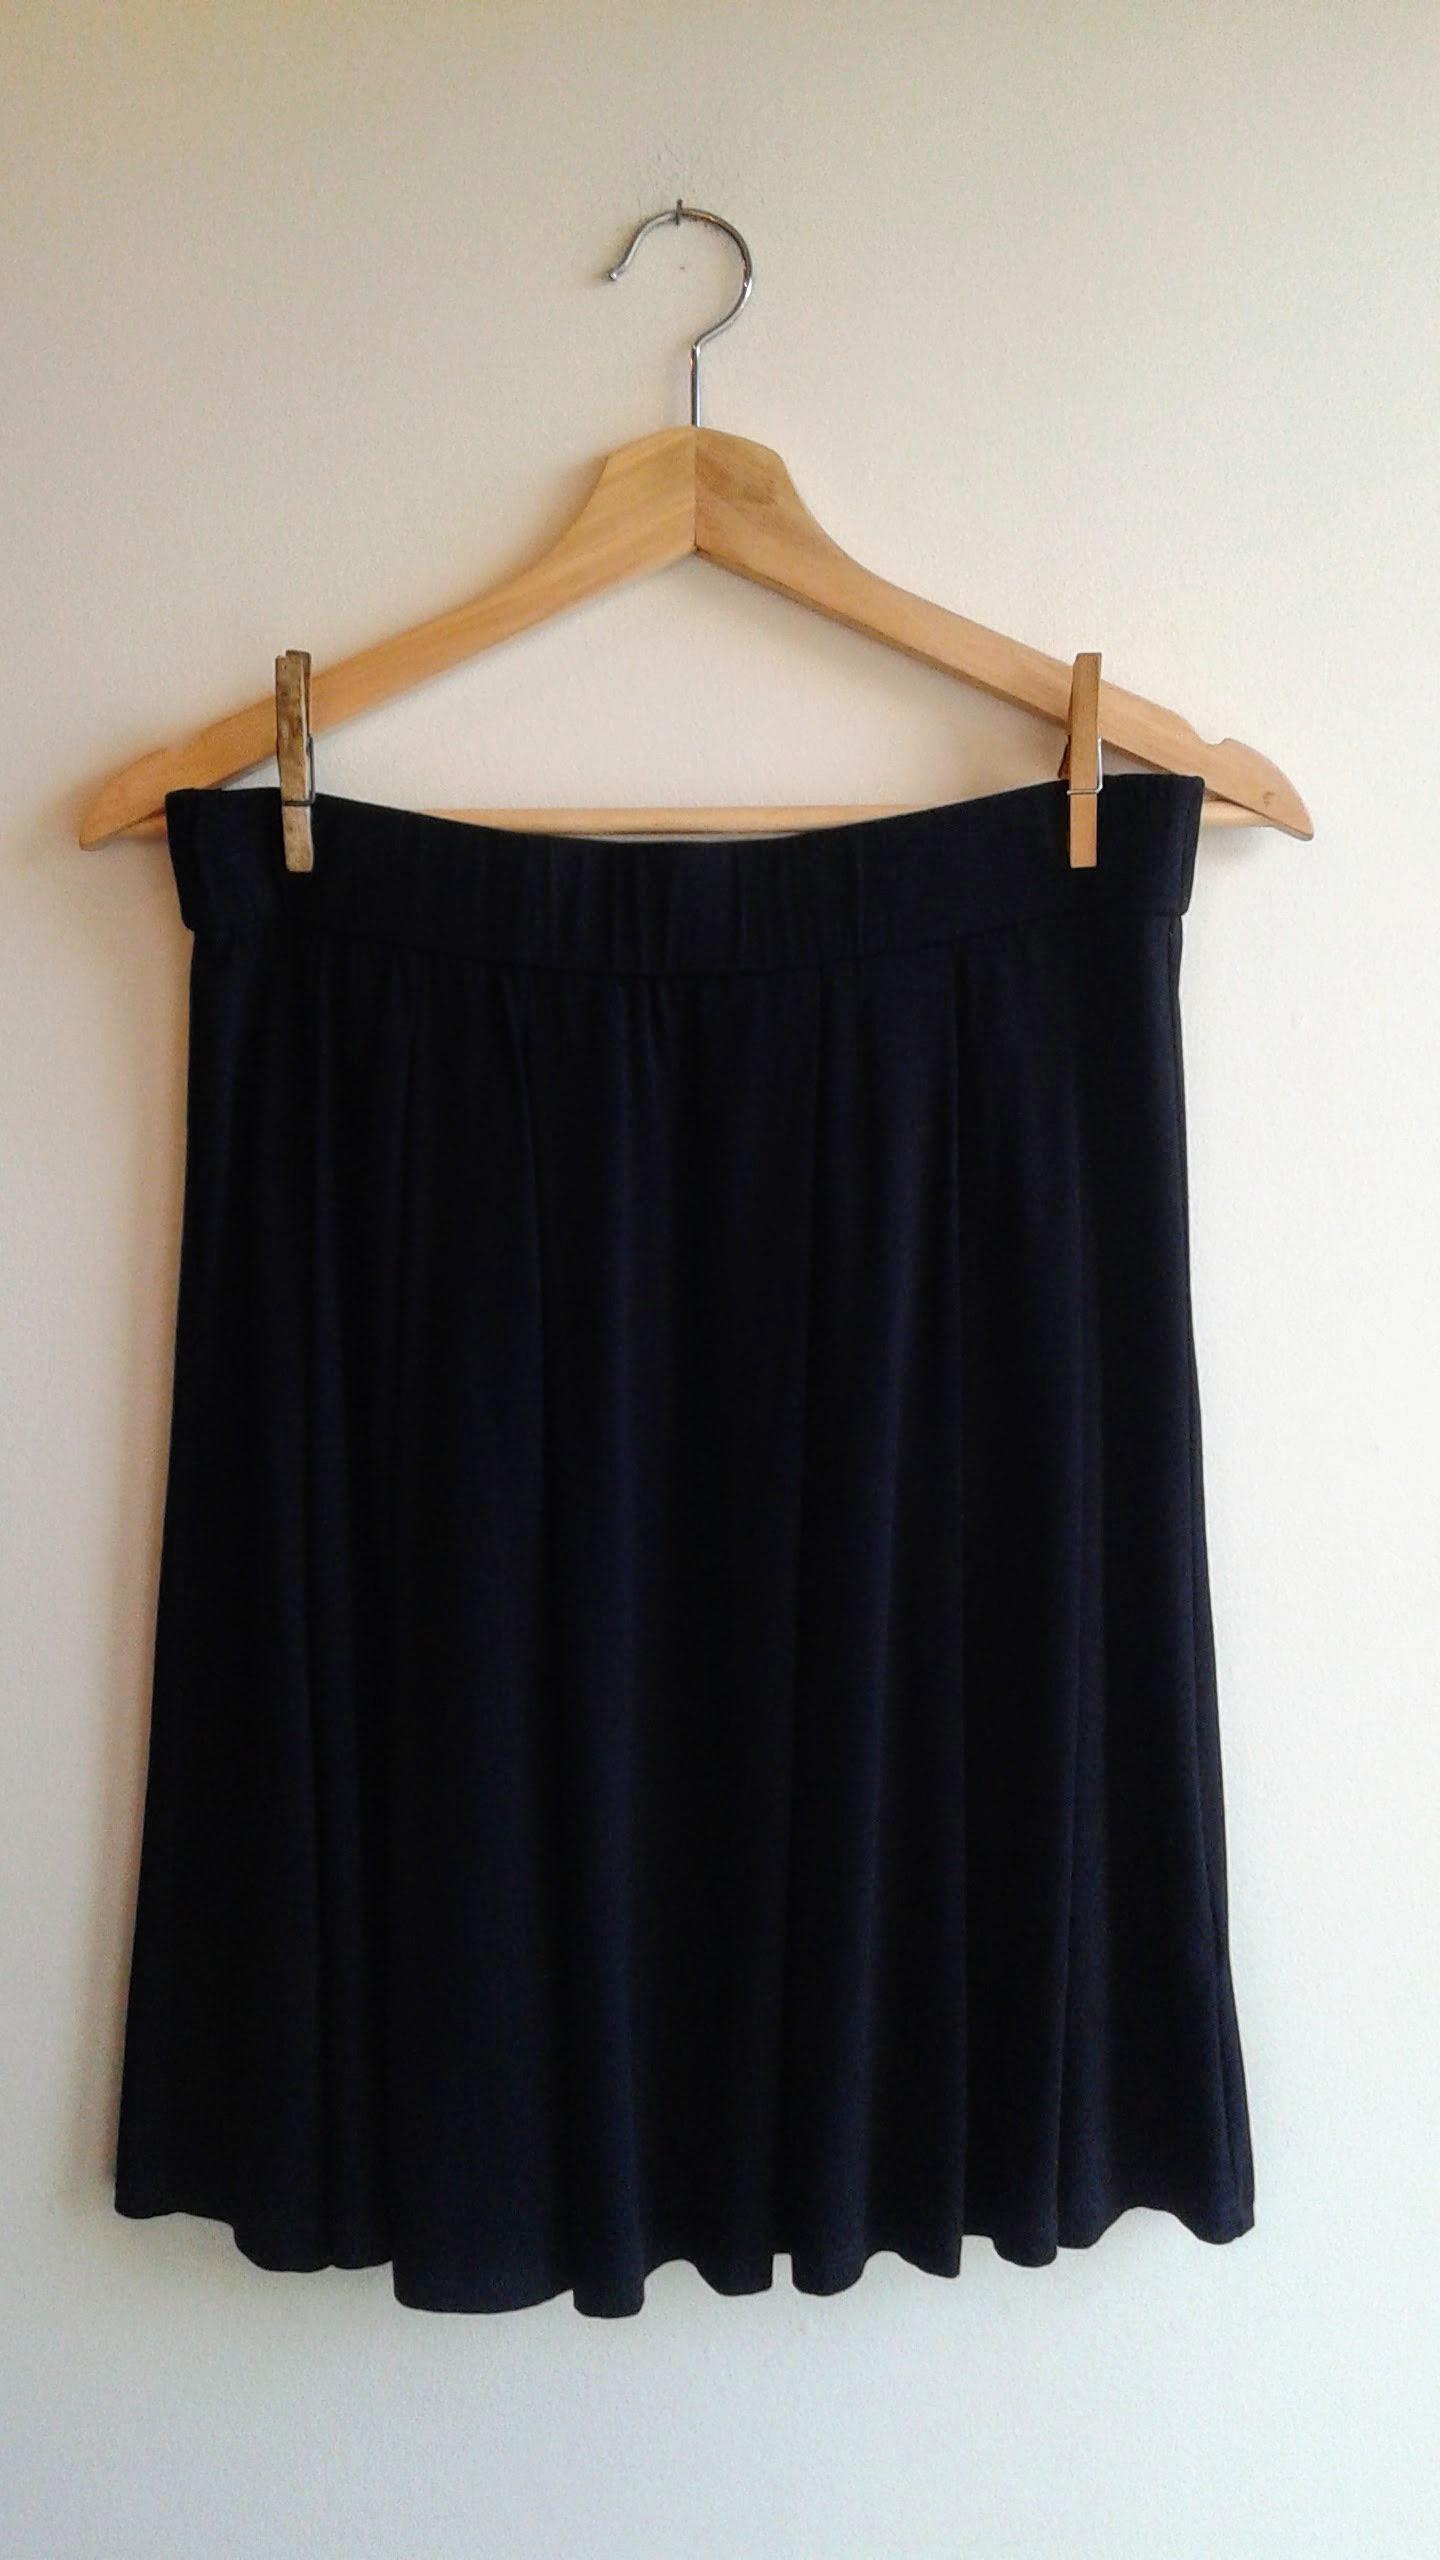 Eileen Fisher skirt; Size M, $36